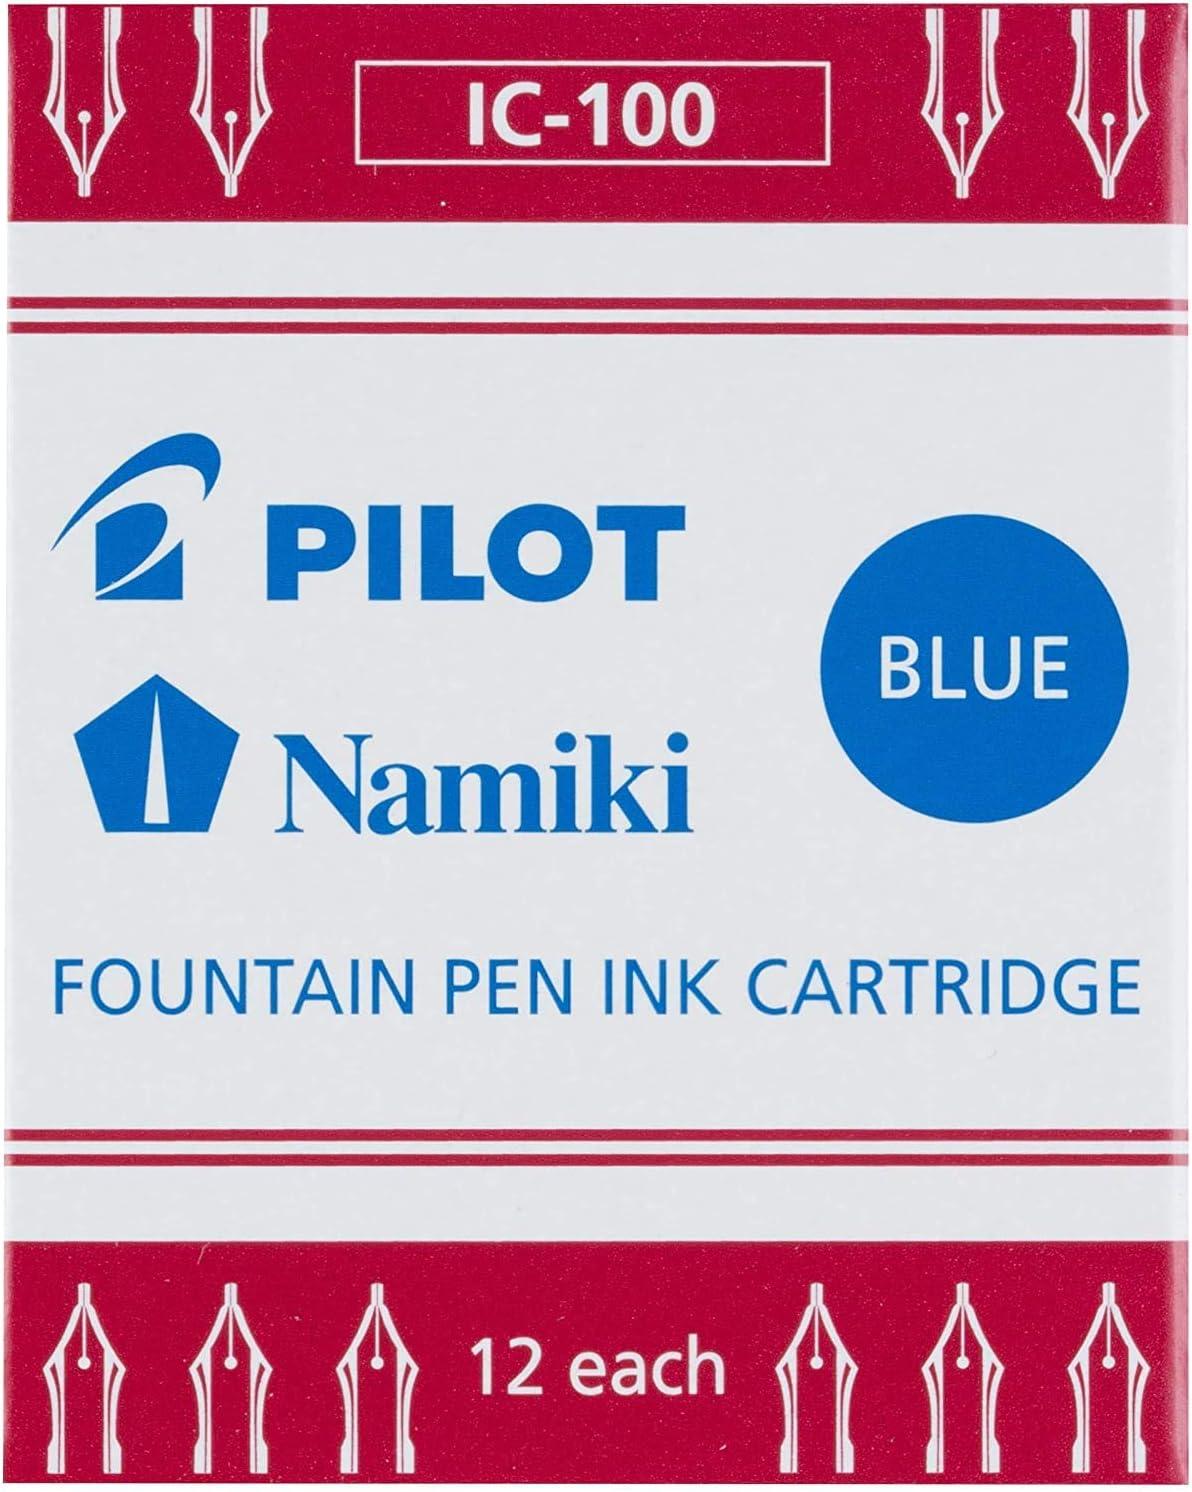 Blue 1 Pack of 12 PILOT Namiki IC100 Fountain Pen Ink Cartridges